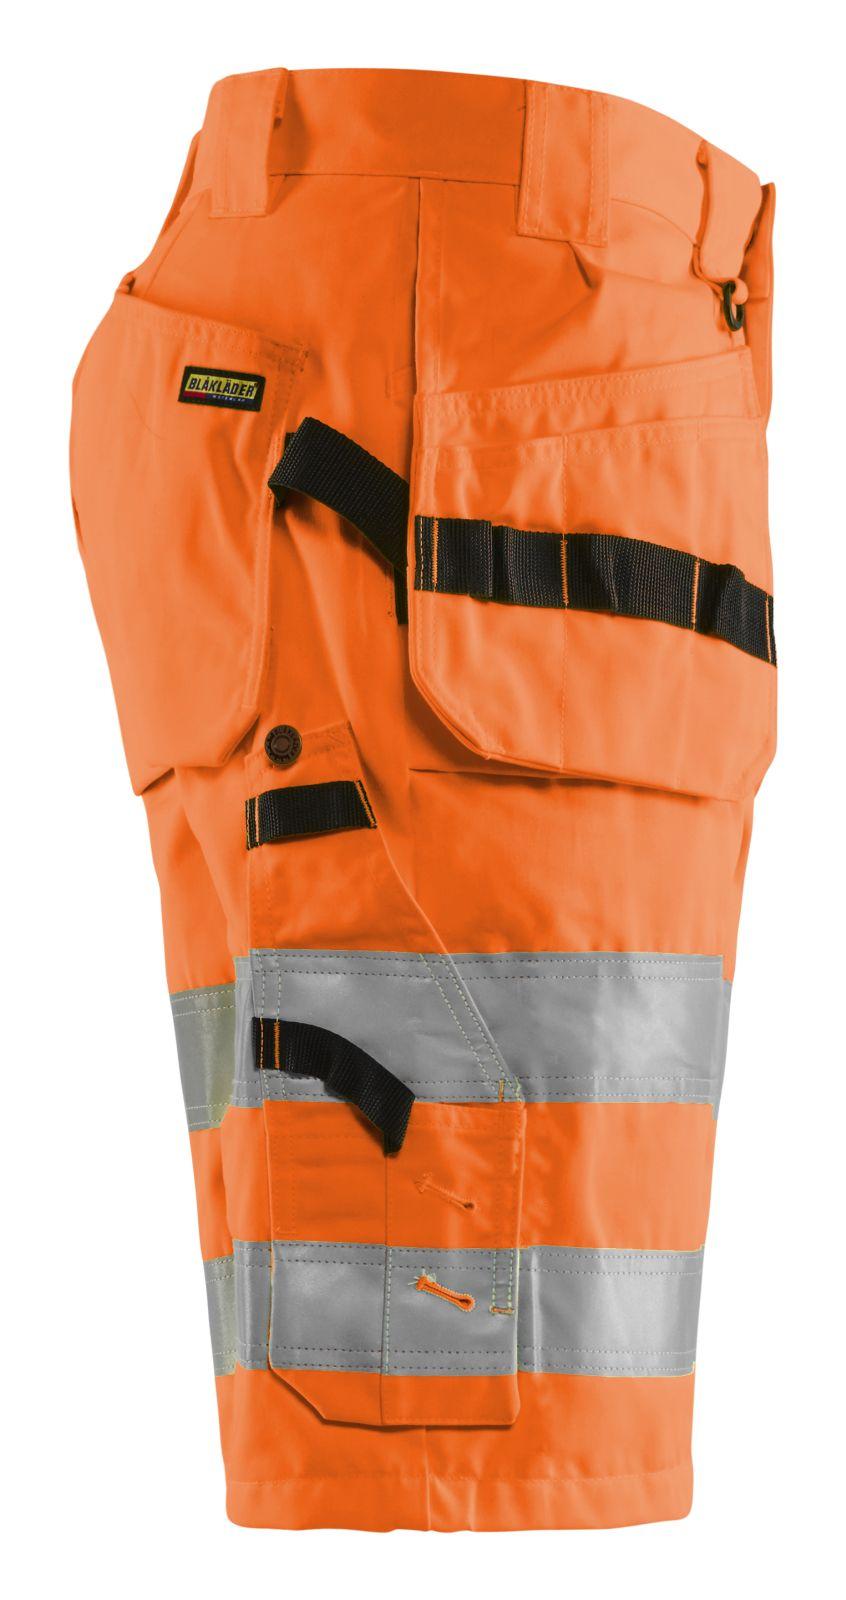 Blaklader Korte werkbroeken 15351804 High Vis fluo-oranje(5300)